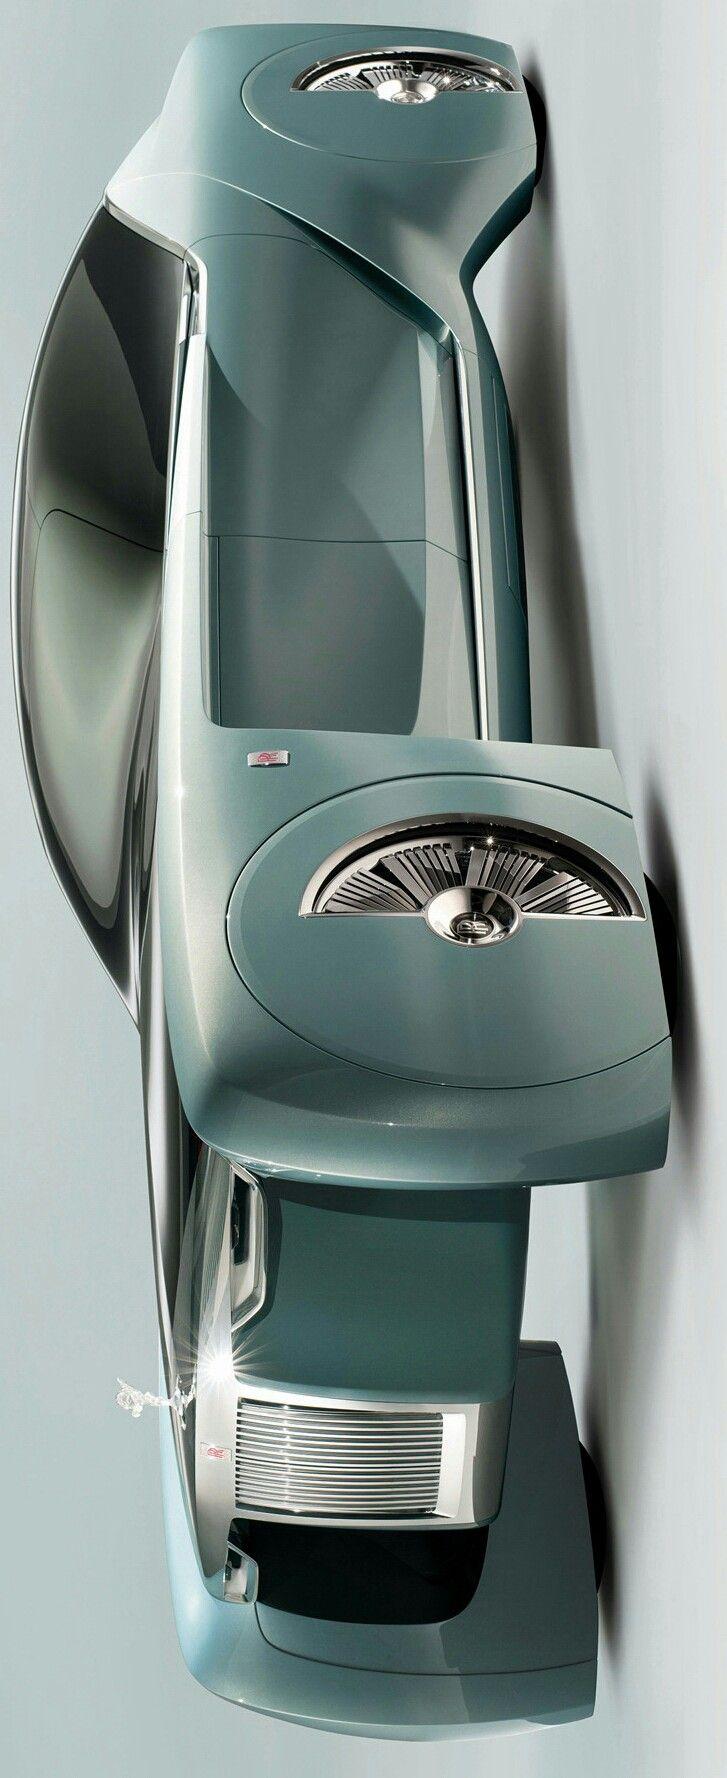 2016 Rolls Royce Vision Next 100 by Levon